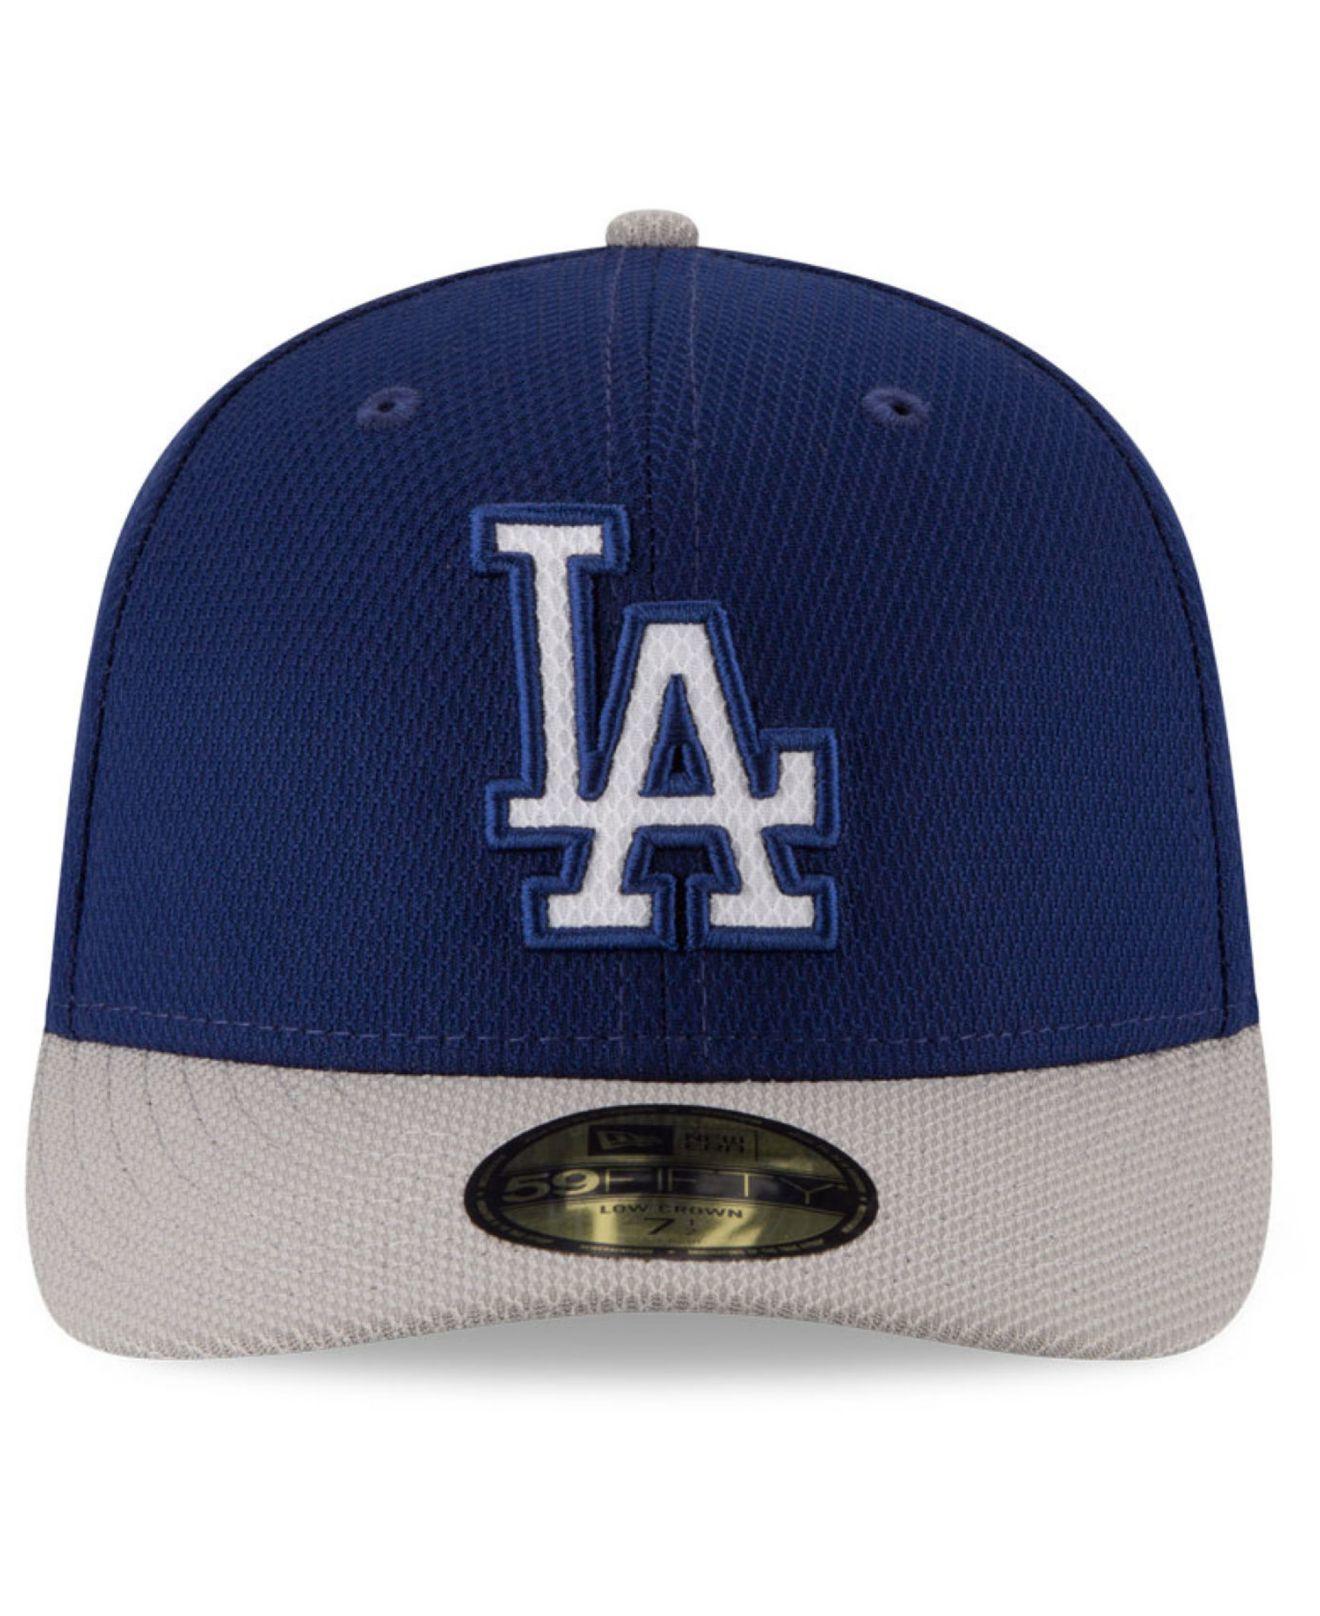 f9f2da099c6 Lyst - KTZ Los Angeles Dodgers Low Profile Diamond Era 59fifty Cap ...